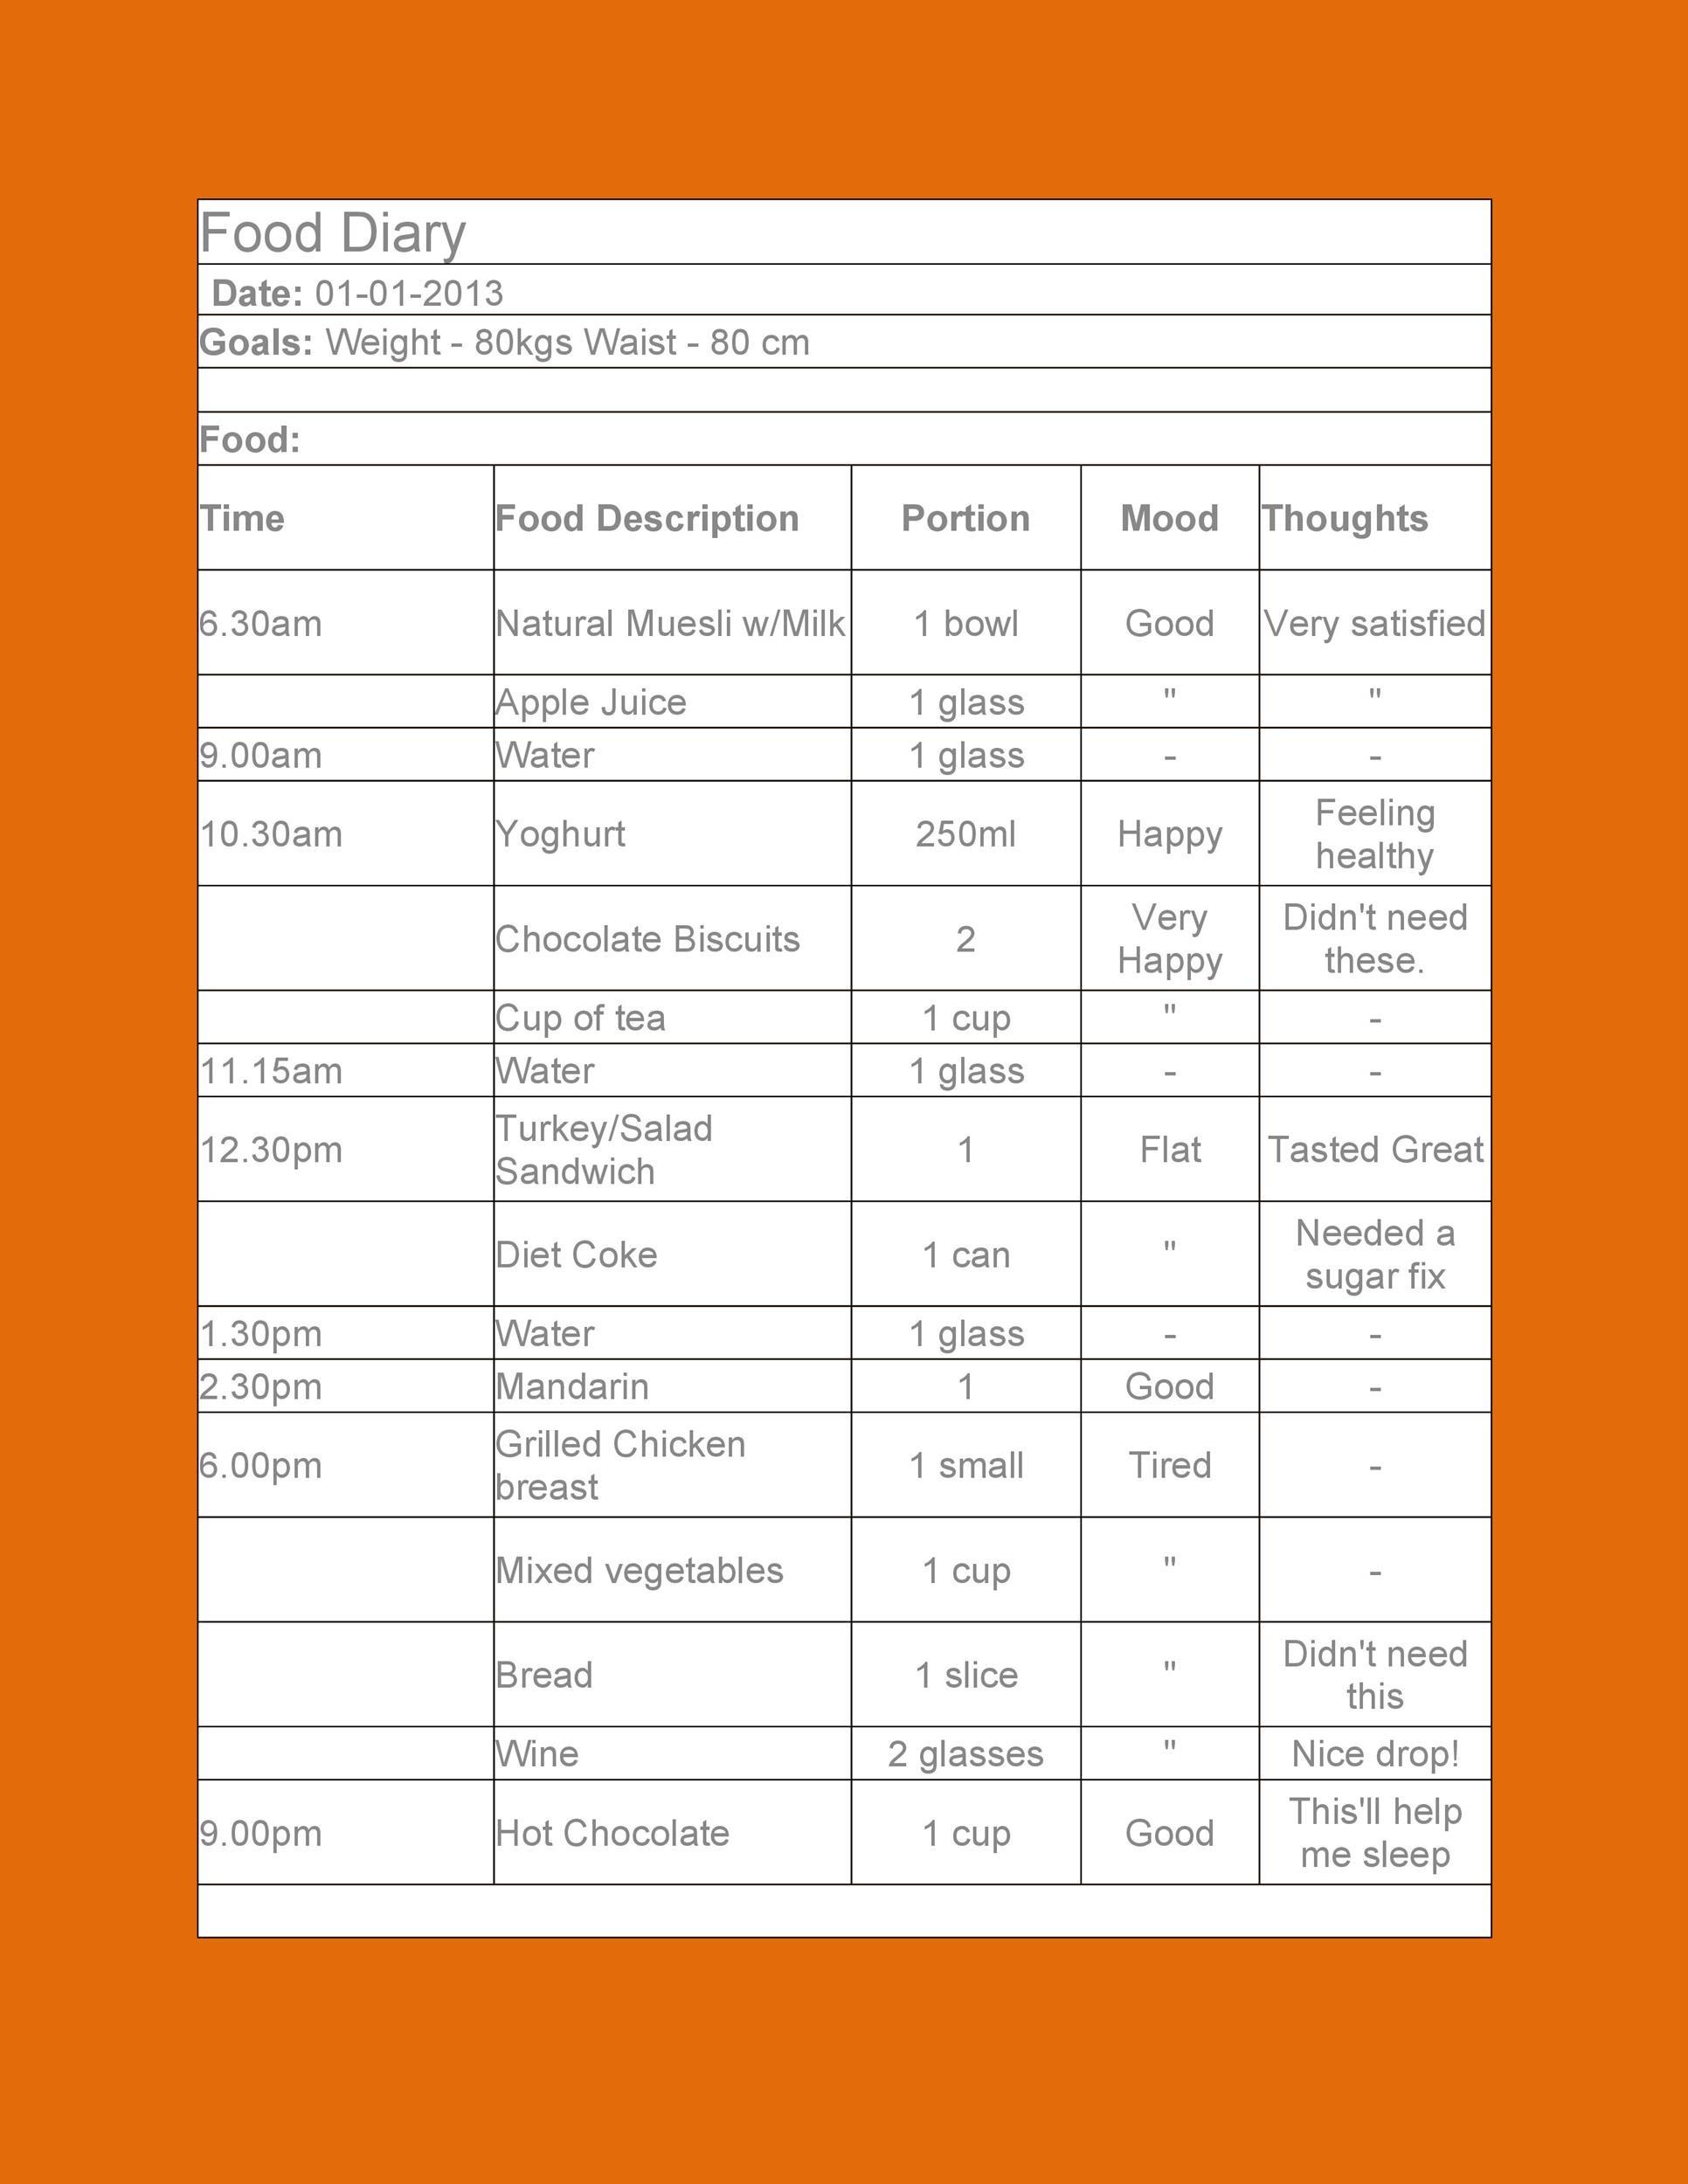 40 Simple Food Diary Templates  Food Log Examples - food journal sample